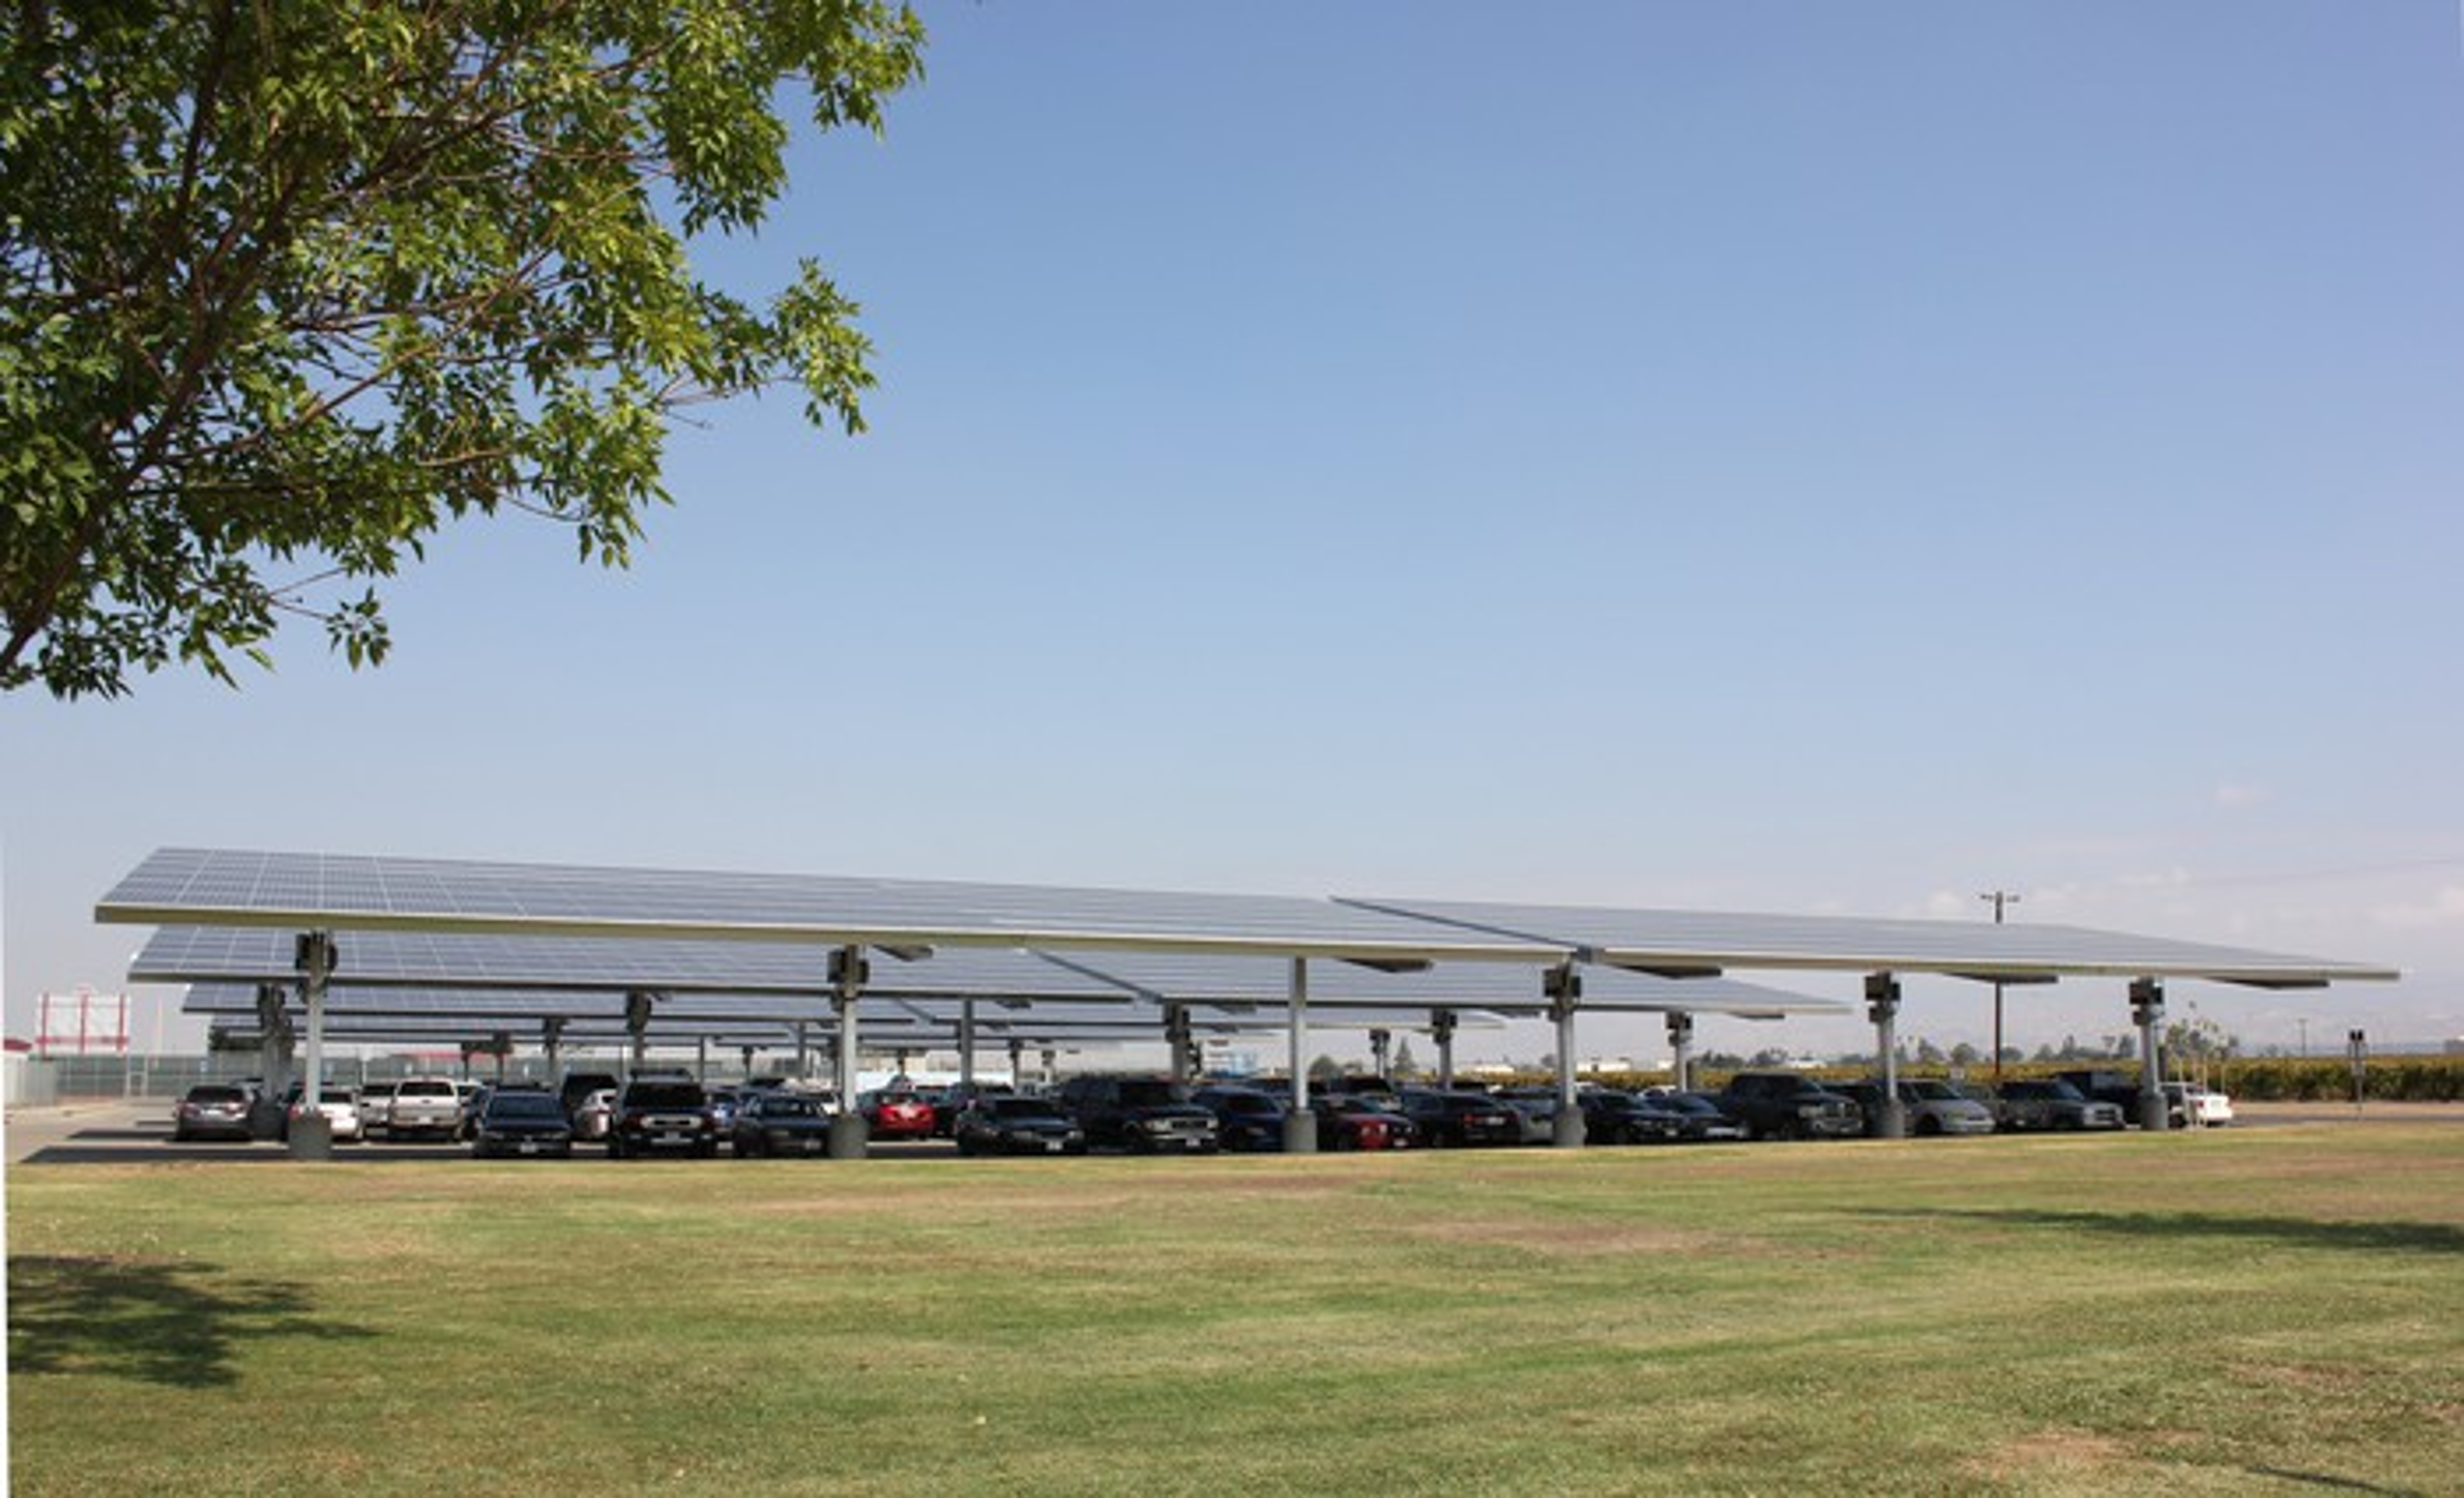 Carport in California on a sunny day.